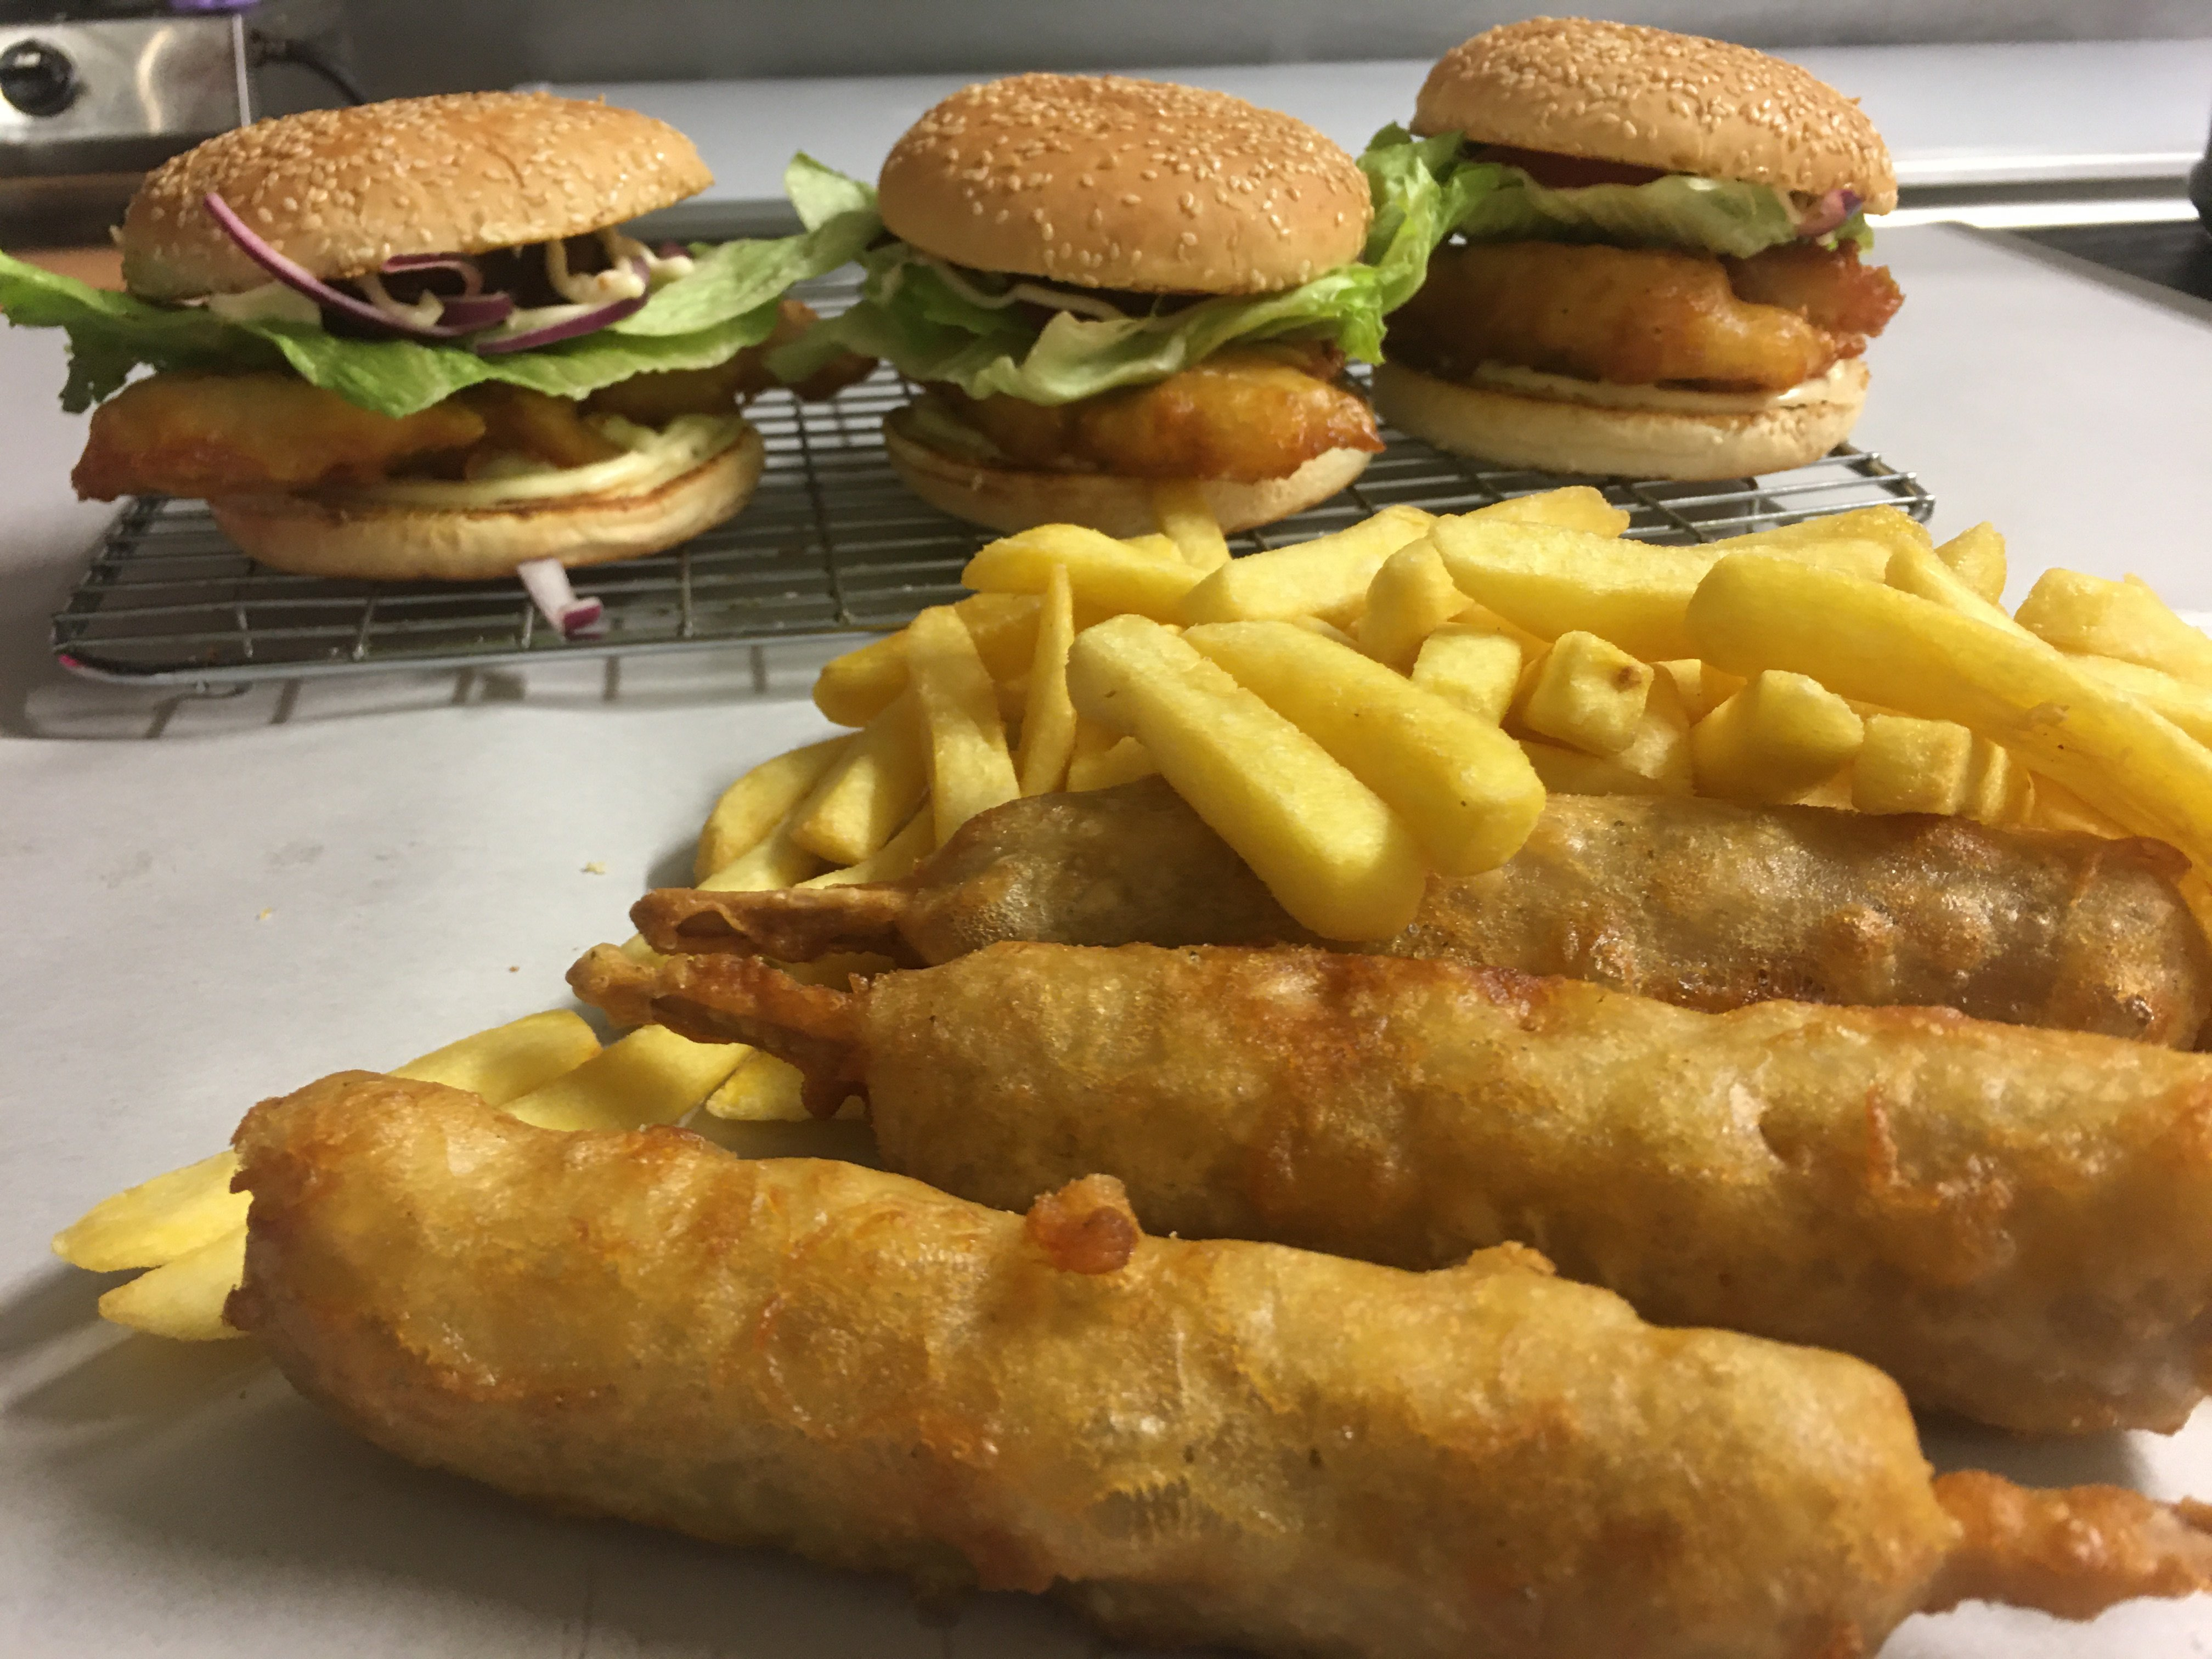 PLU-A7 3 x Hoki Burgers, 3 x Hot Dogs, $6 chips